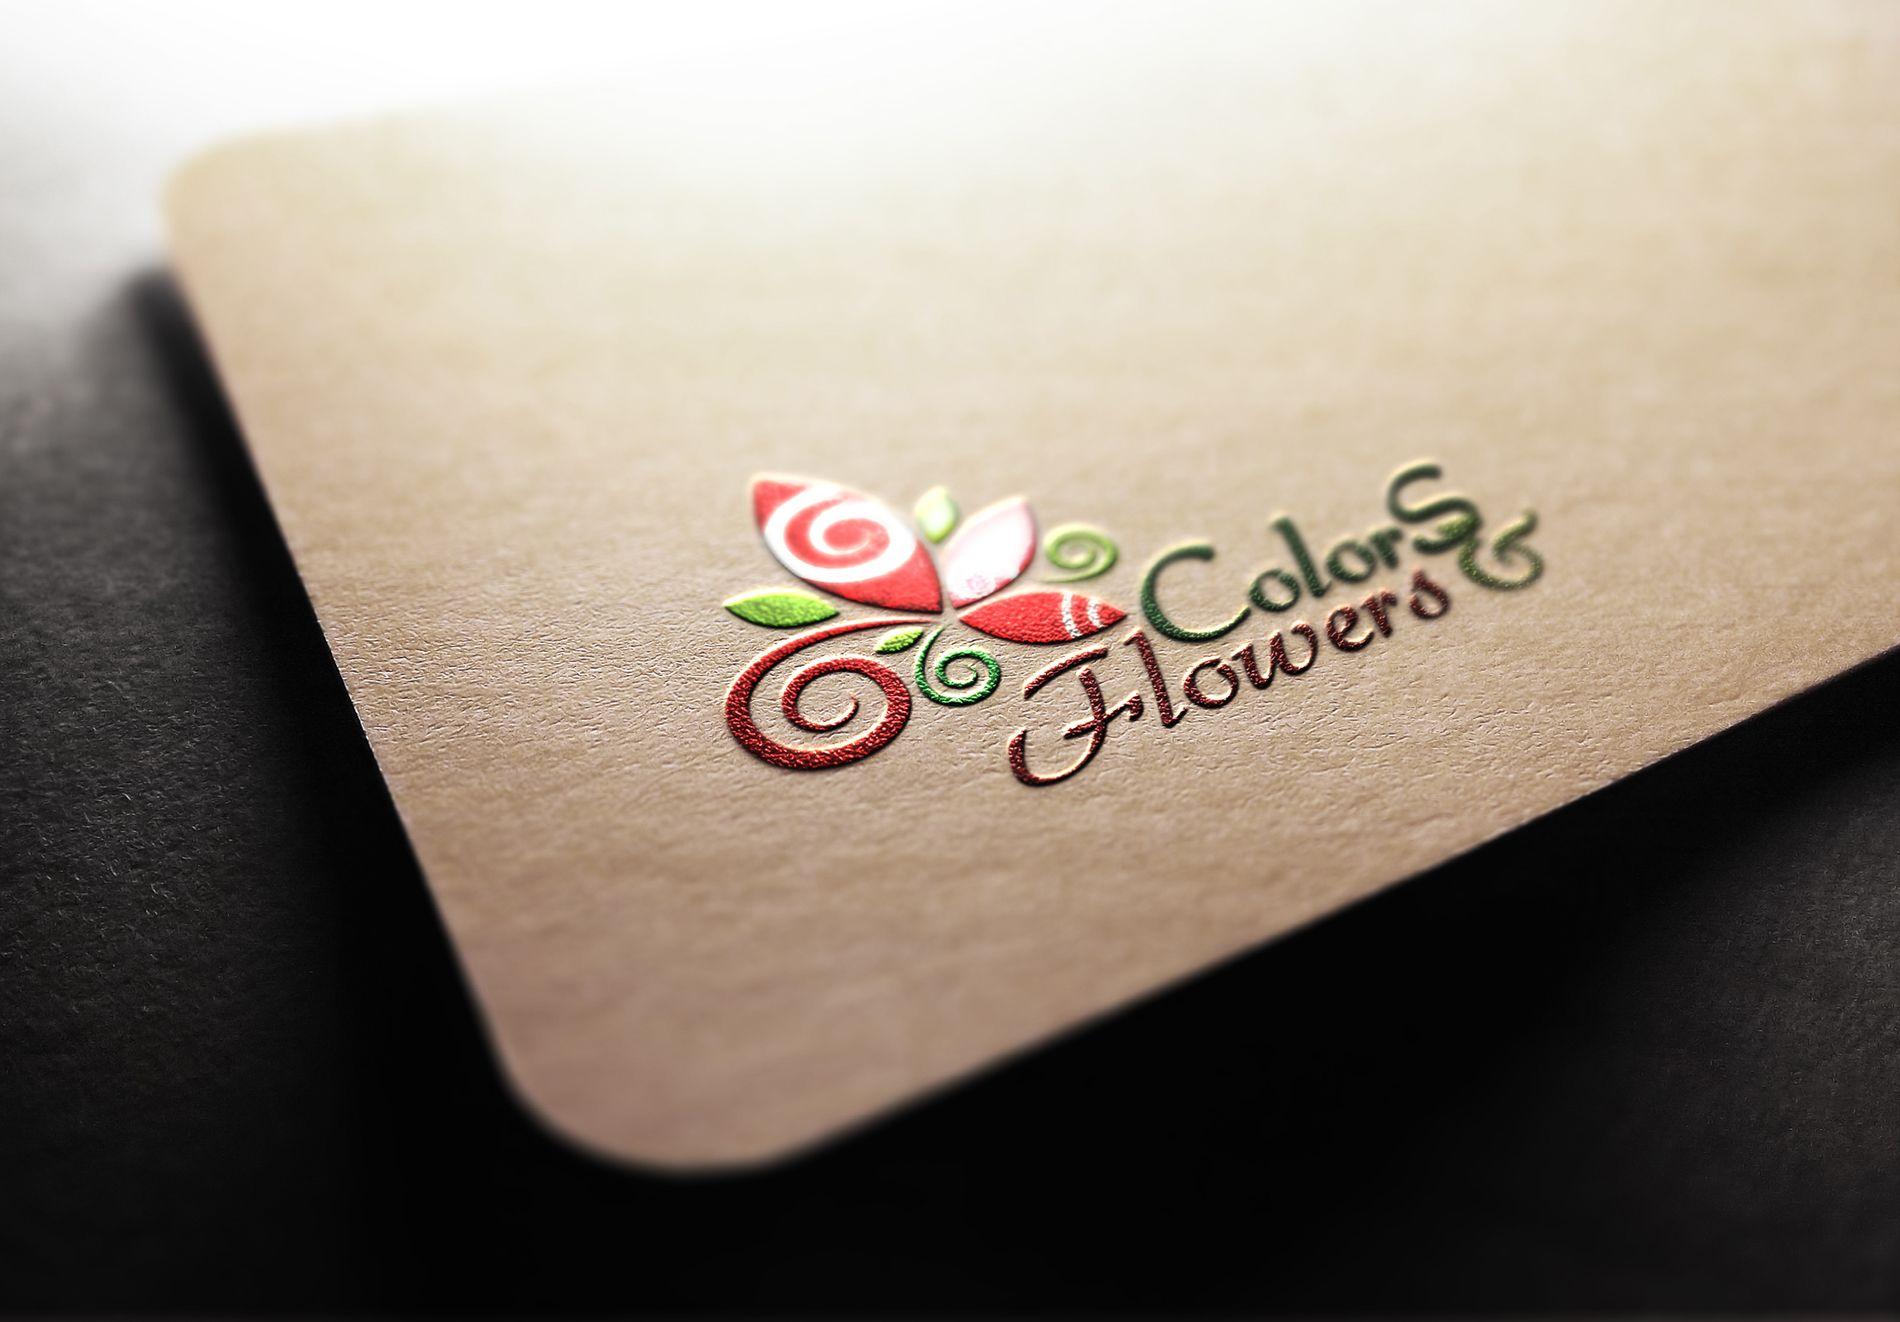 Colors & Flowers Логотип и фирменный стиль - дизайнер valeriana_88